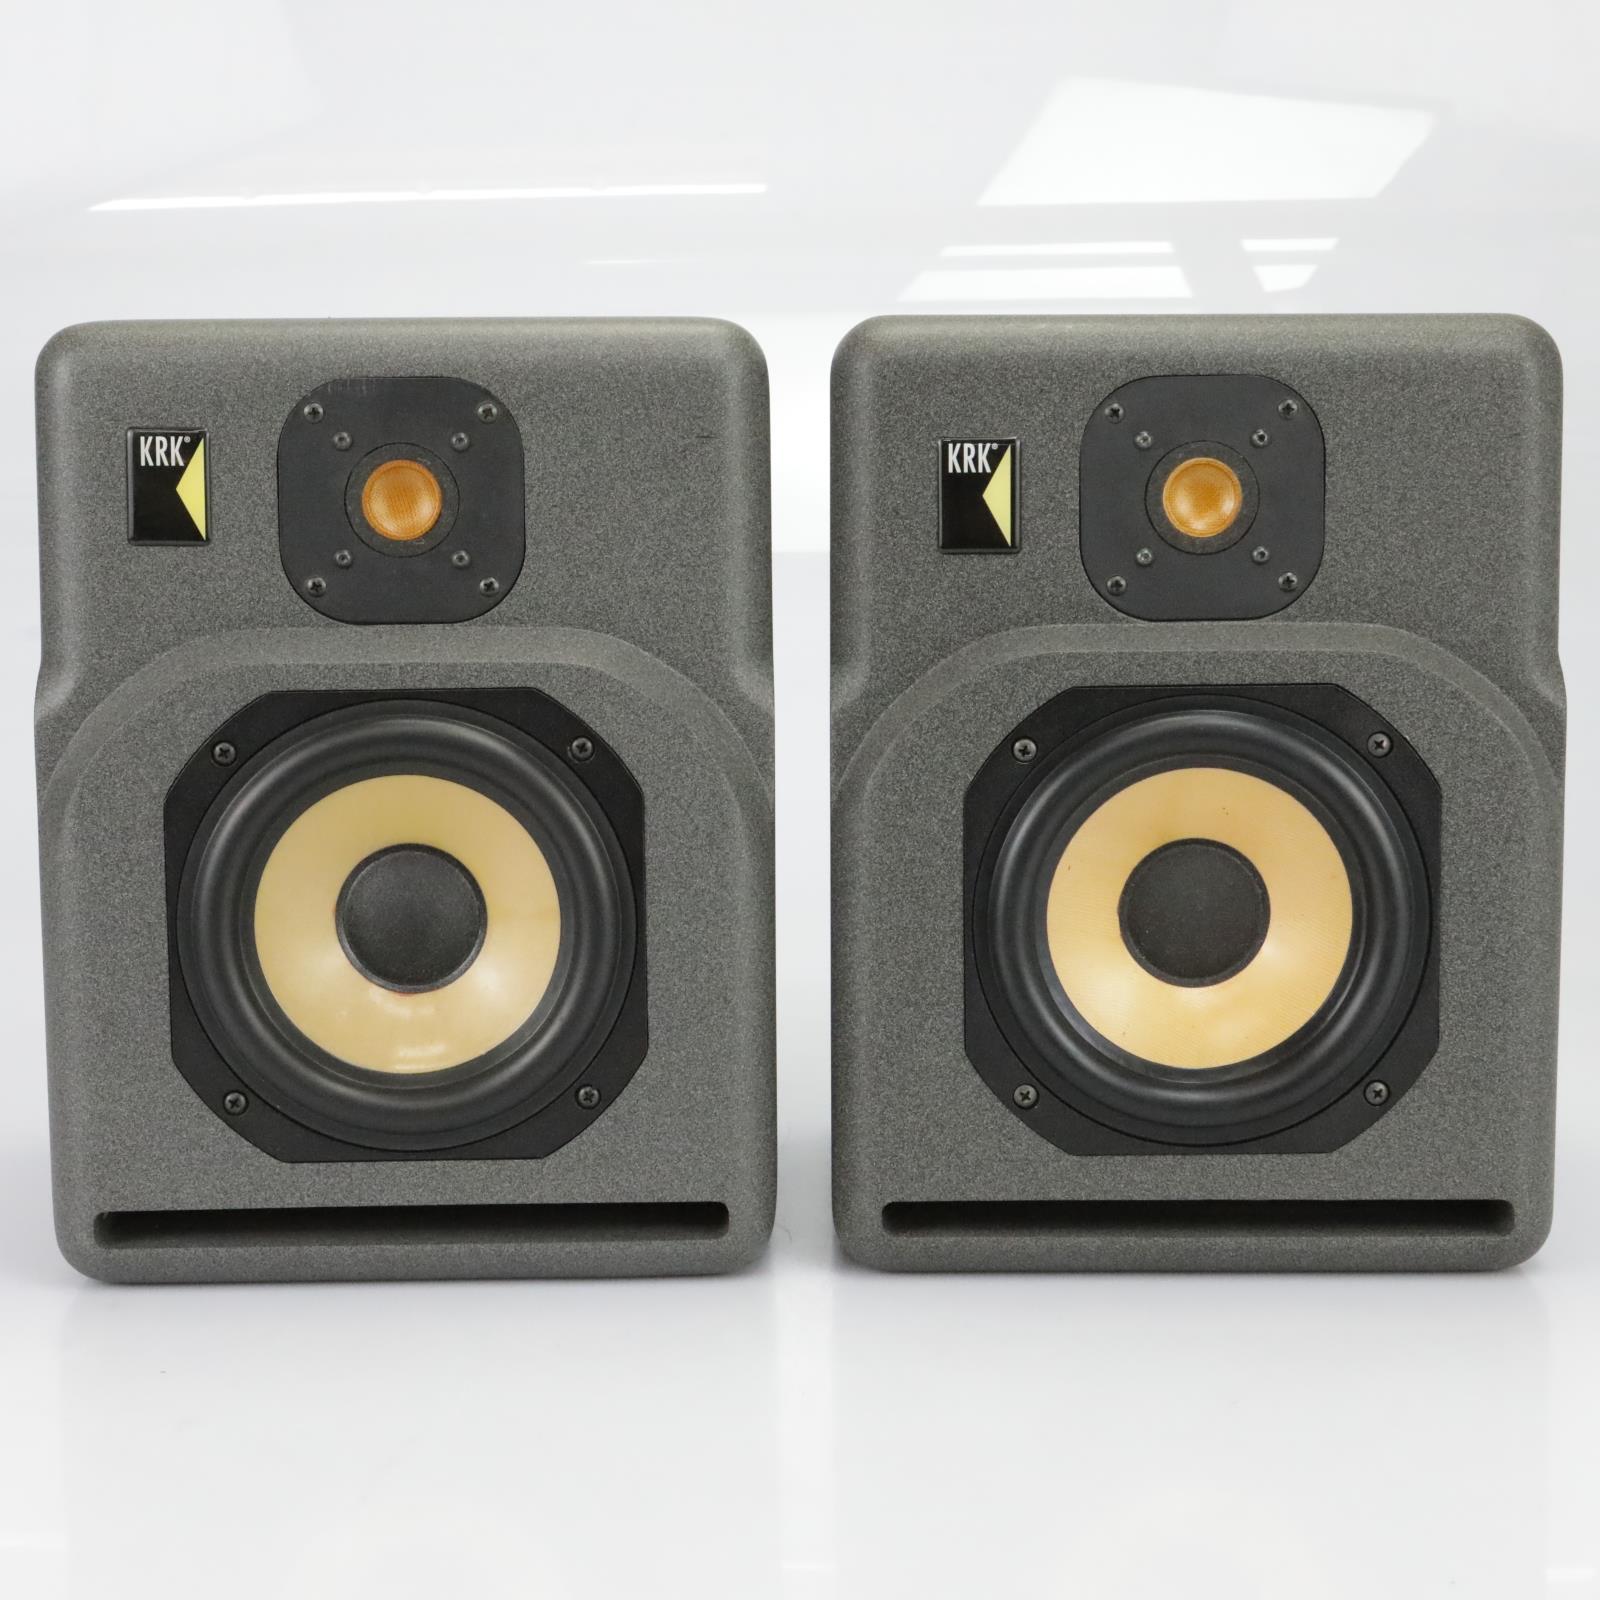 KRK Model 7000B Passive Studio Monitors Speakers Grundman Mastering #39931